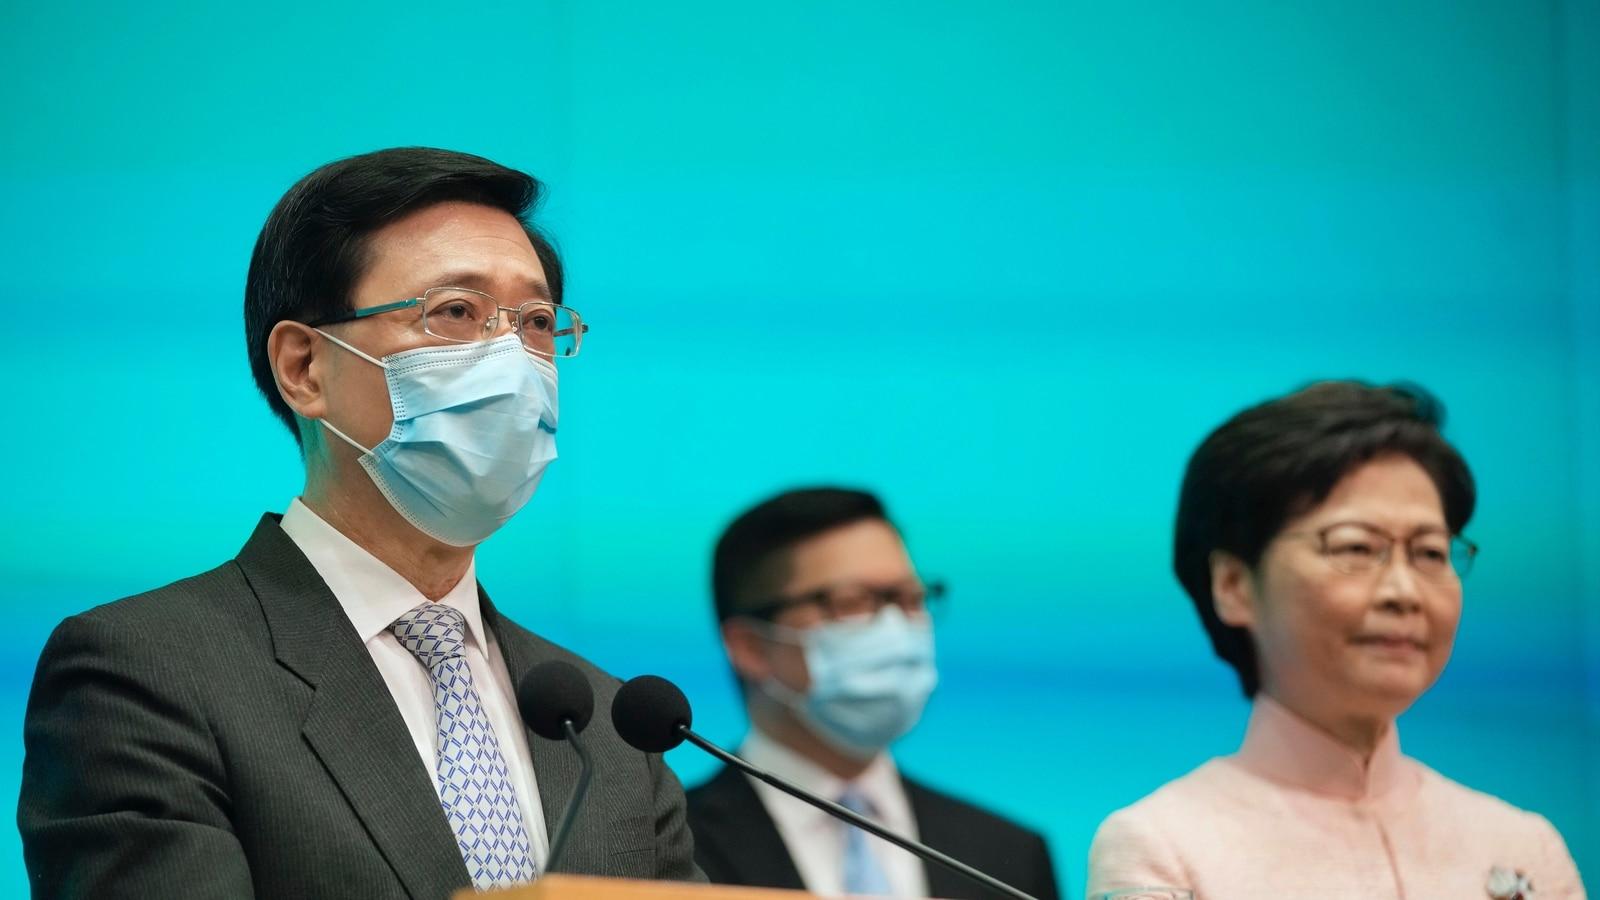 Hong Kong: Ex-cop John Lee named No 2 official as China fortifies security